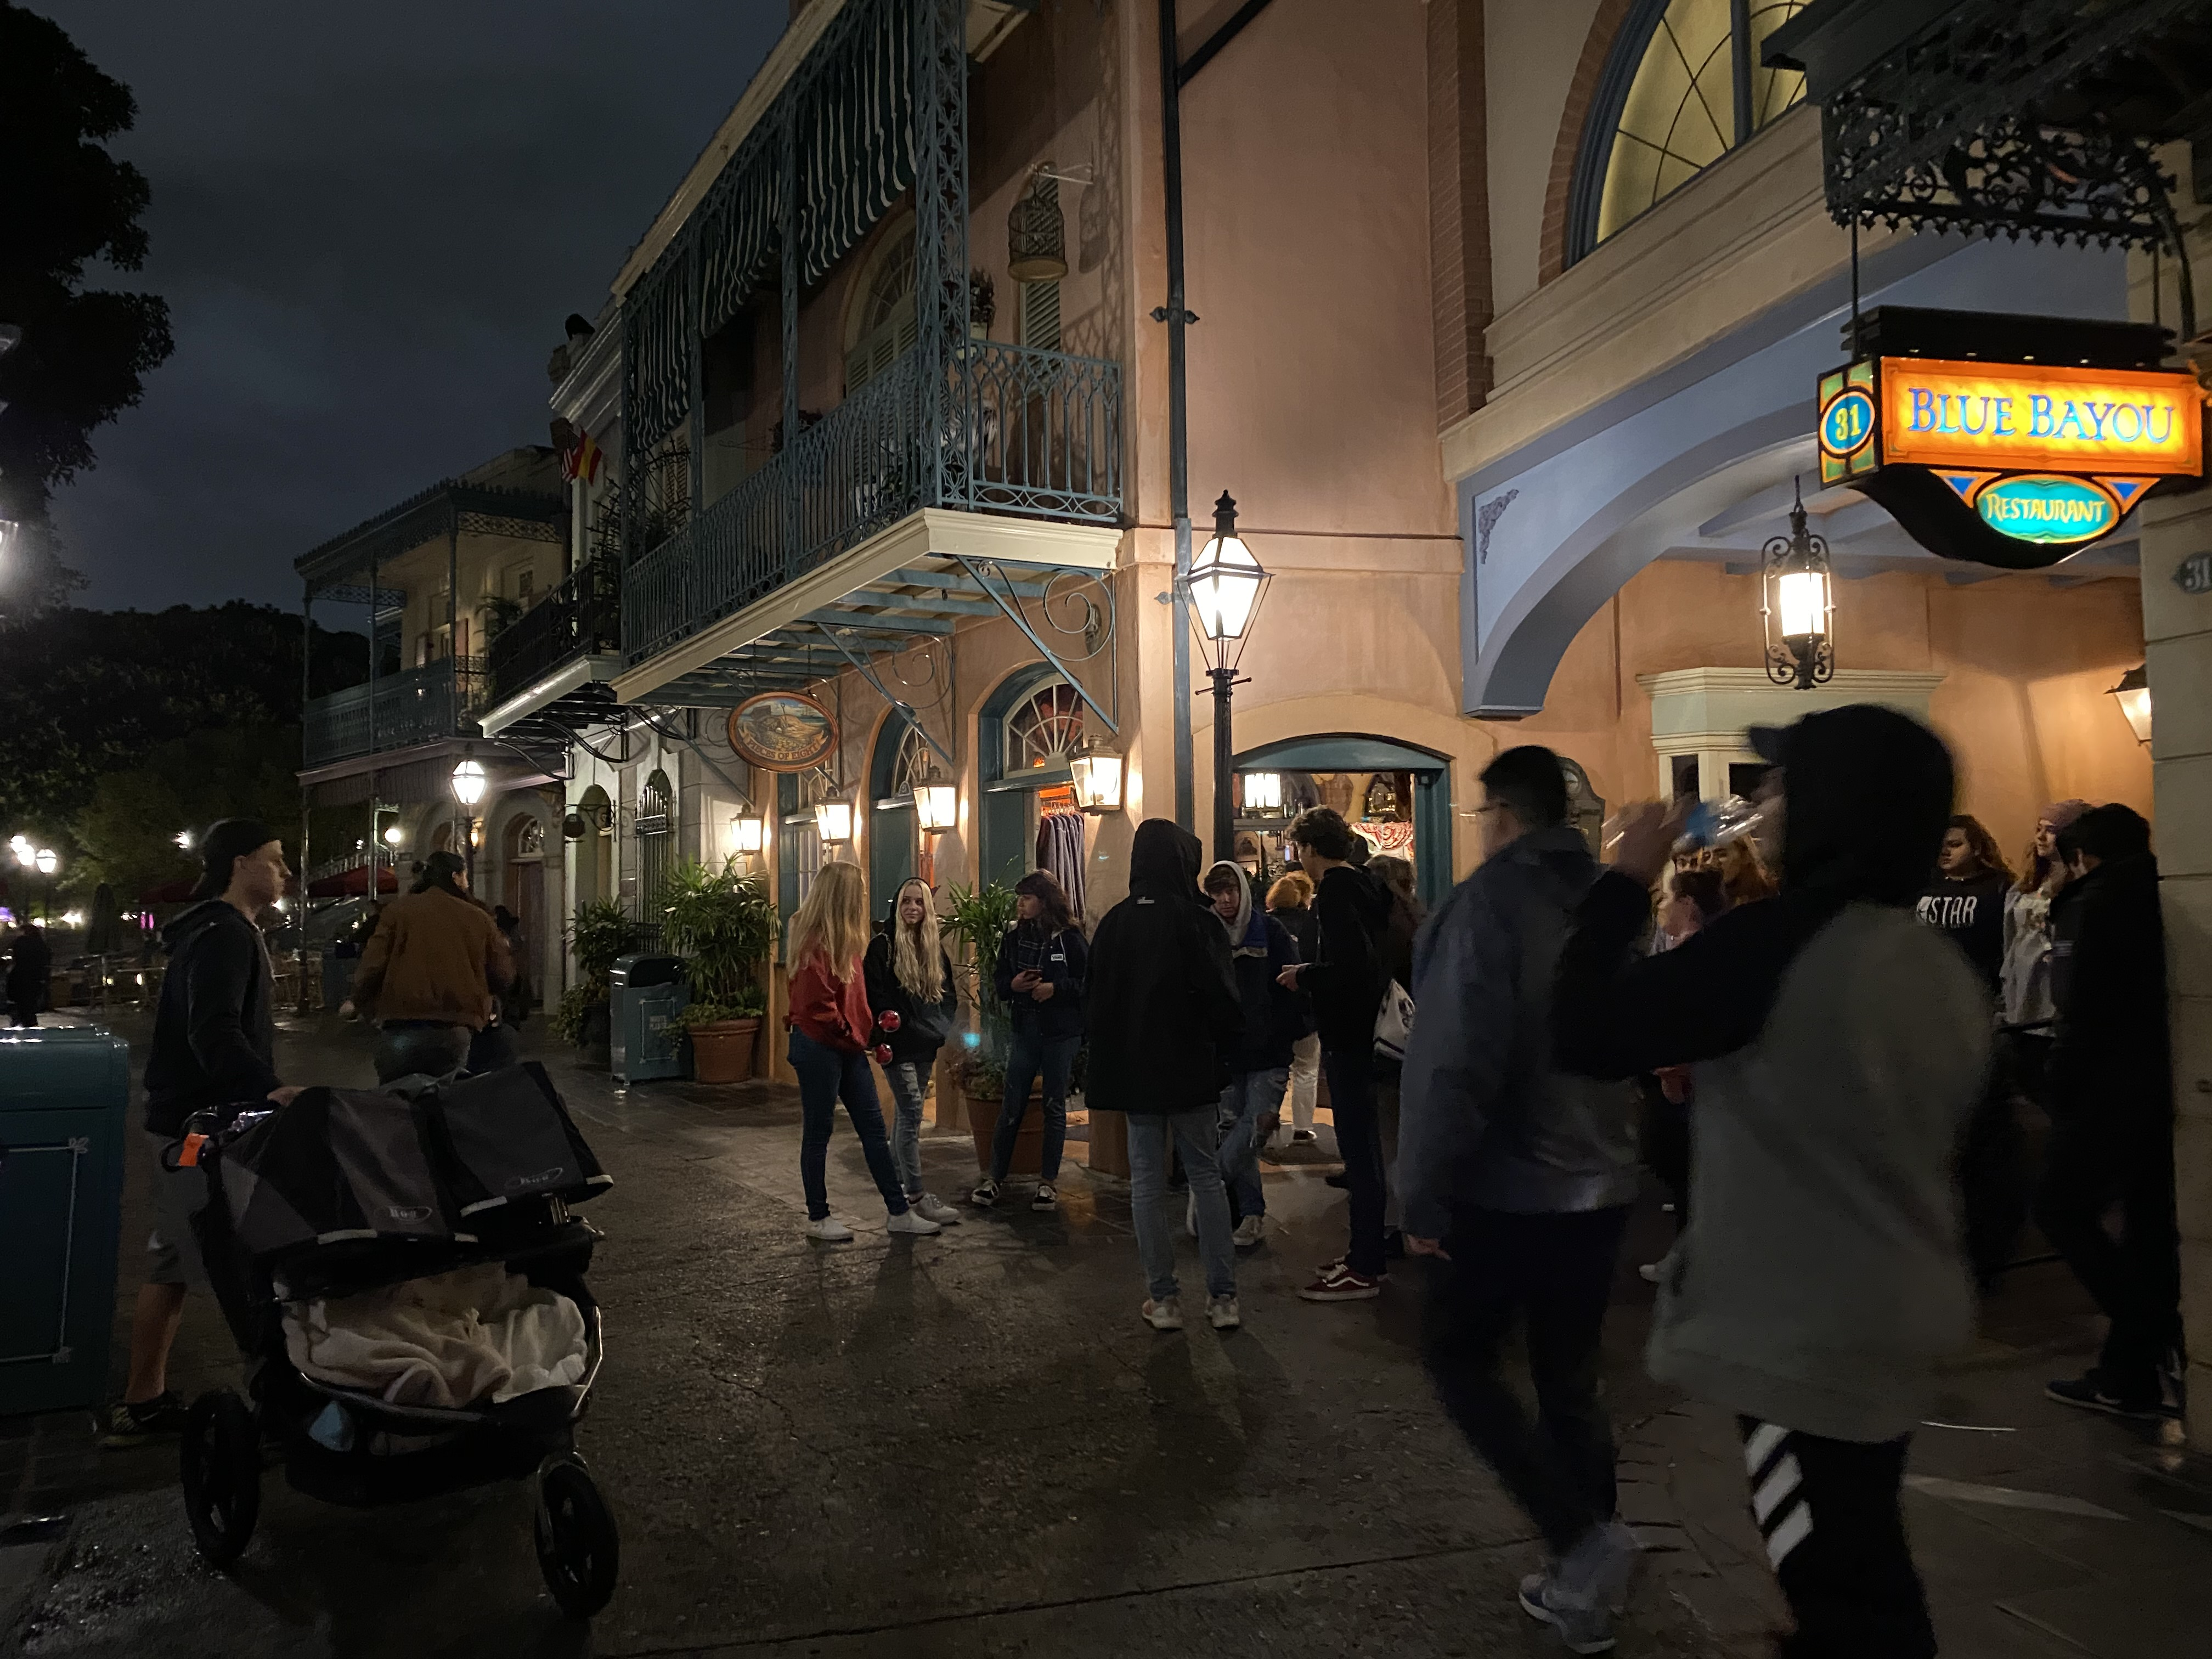 New Orleans Square Disneyland